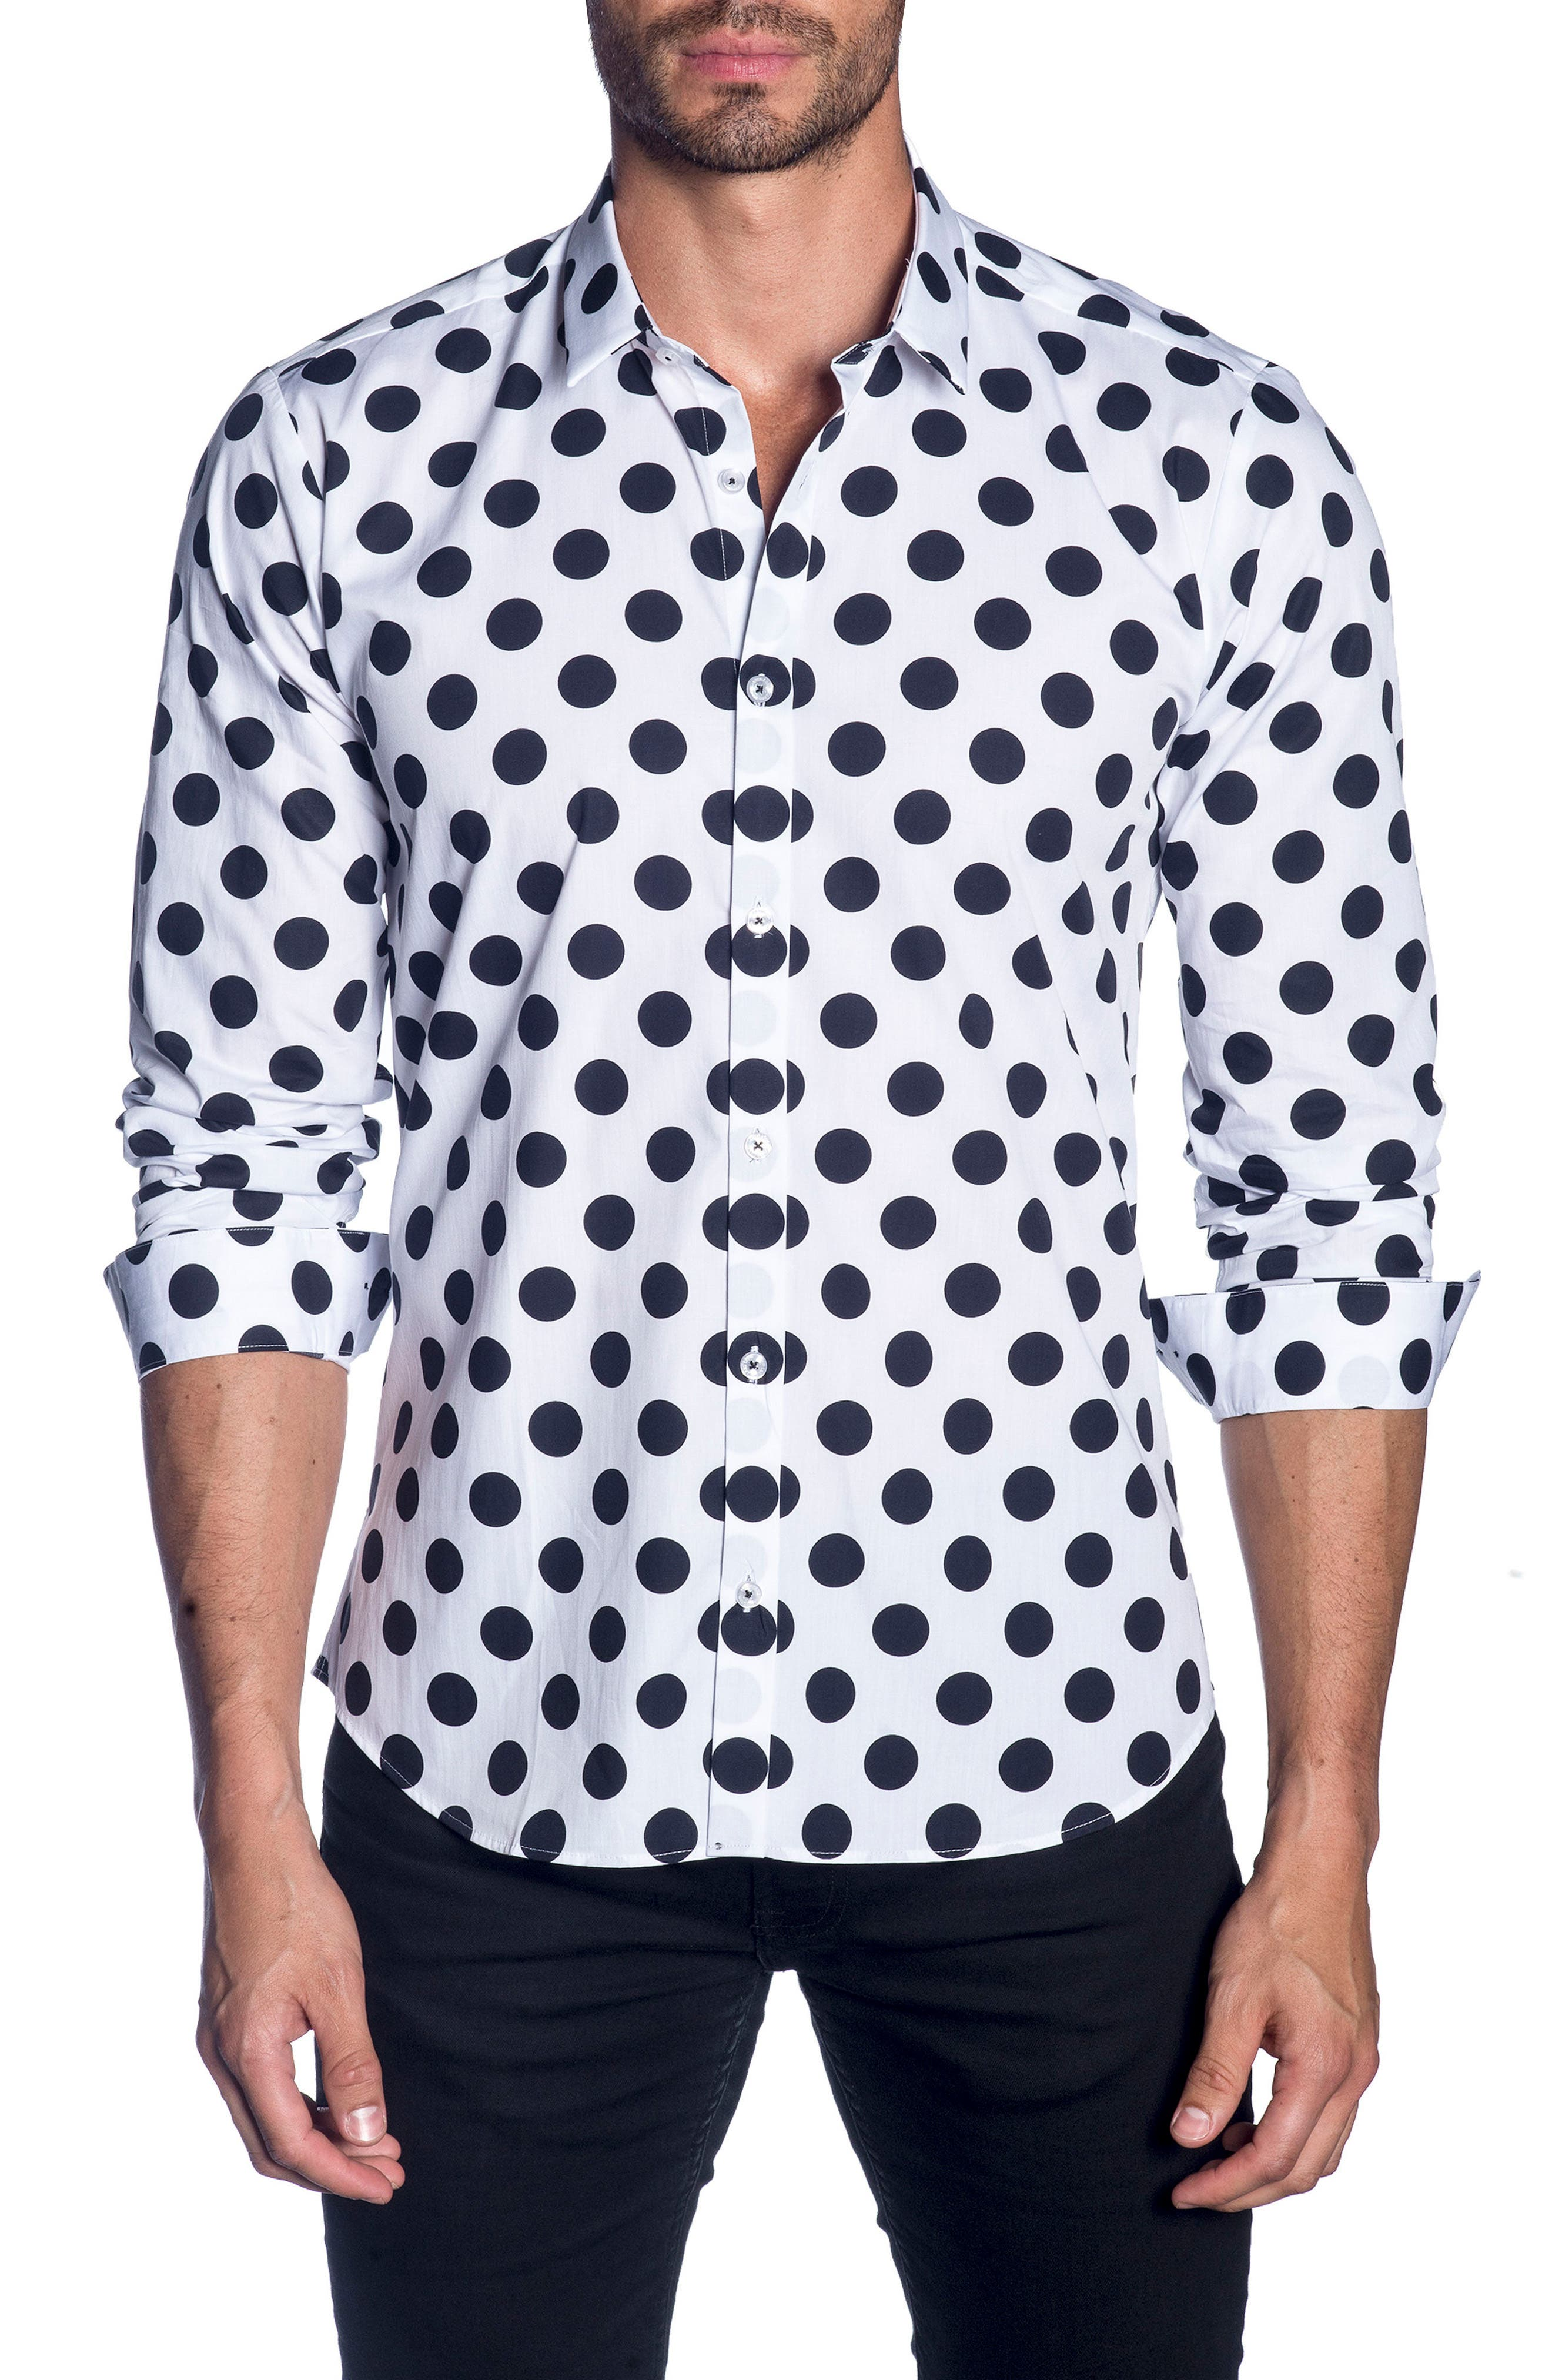 Trim Fit Sport Shirt,                         Main,                         color, WHITE BLACK POLKA DOT